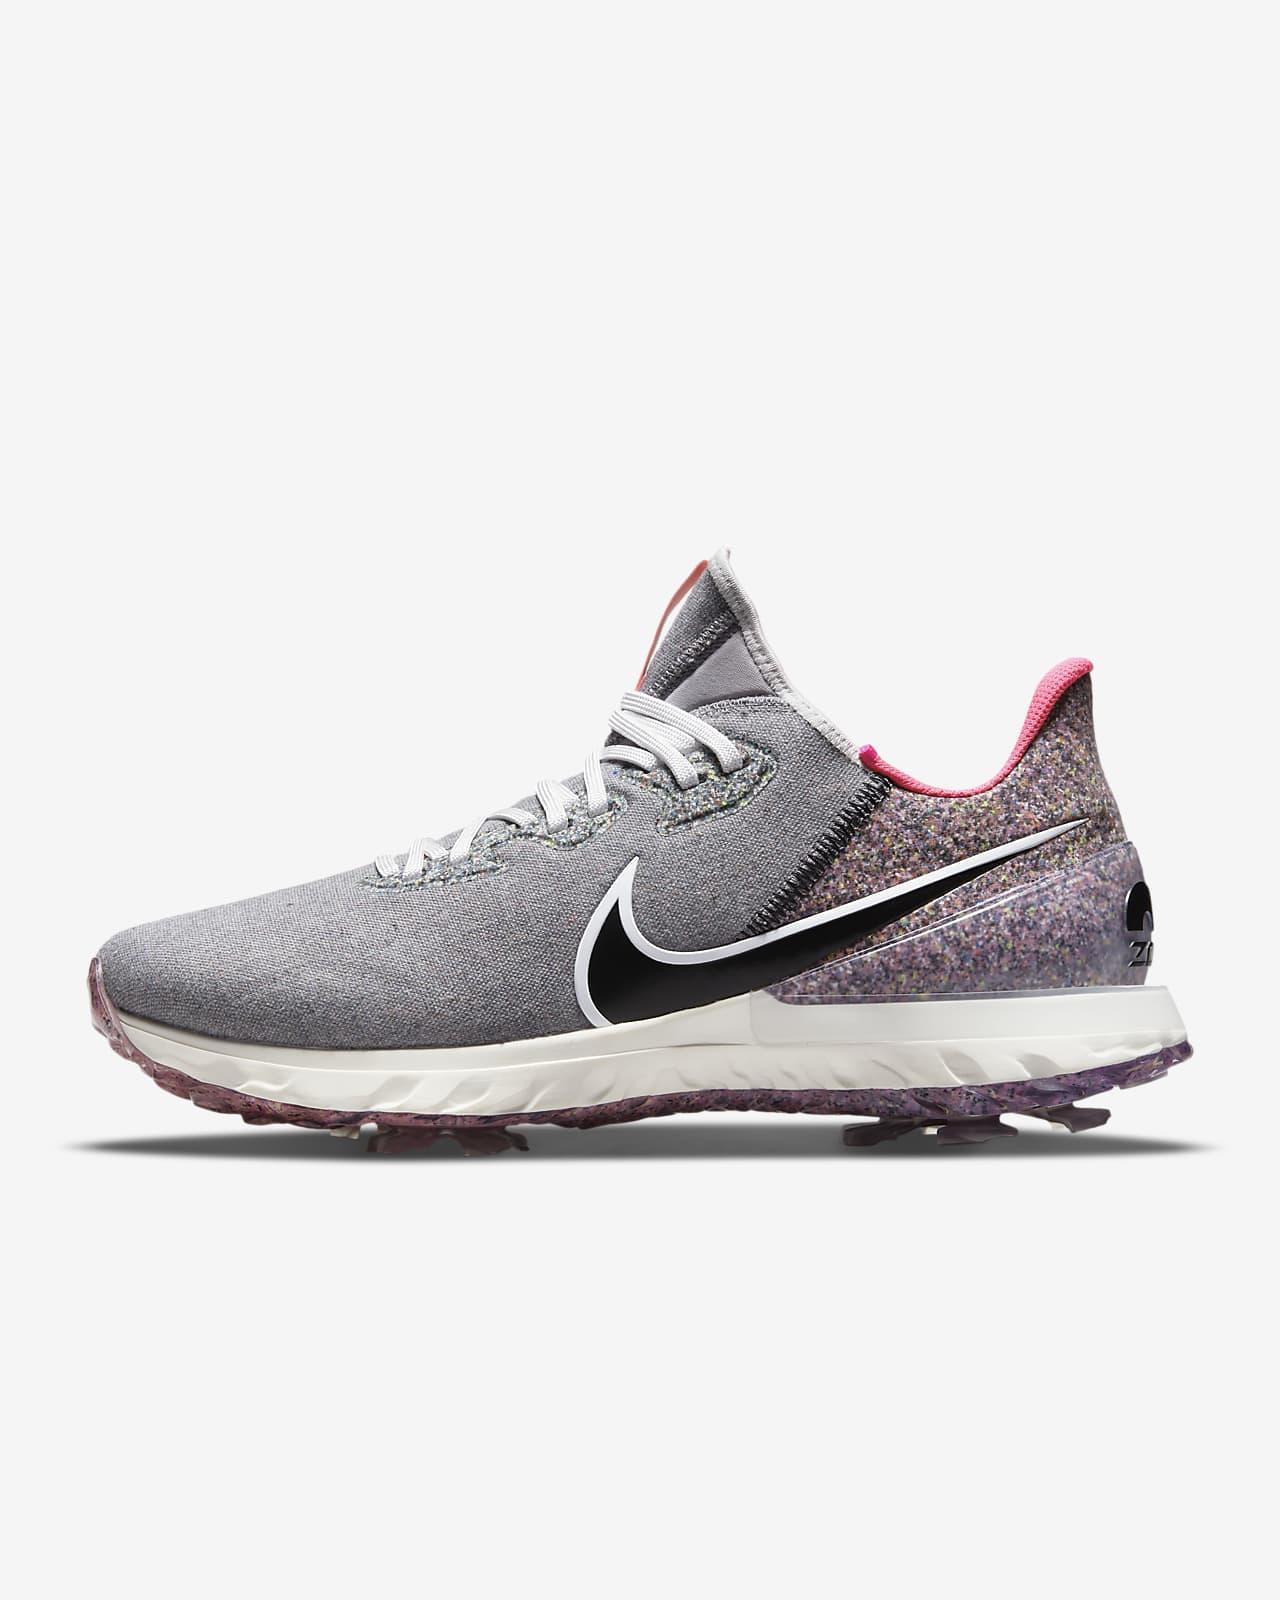 Chaussure de golf Nike Air Zoom Infinity Tour NRG